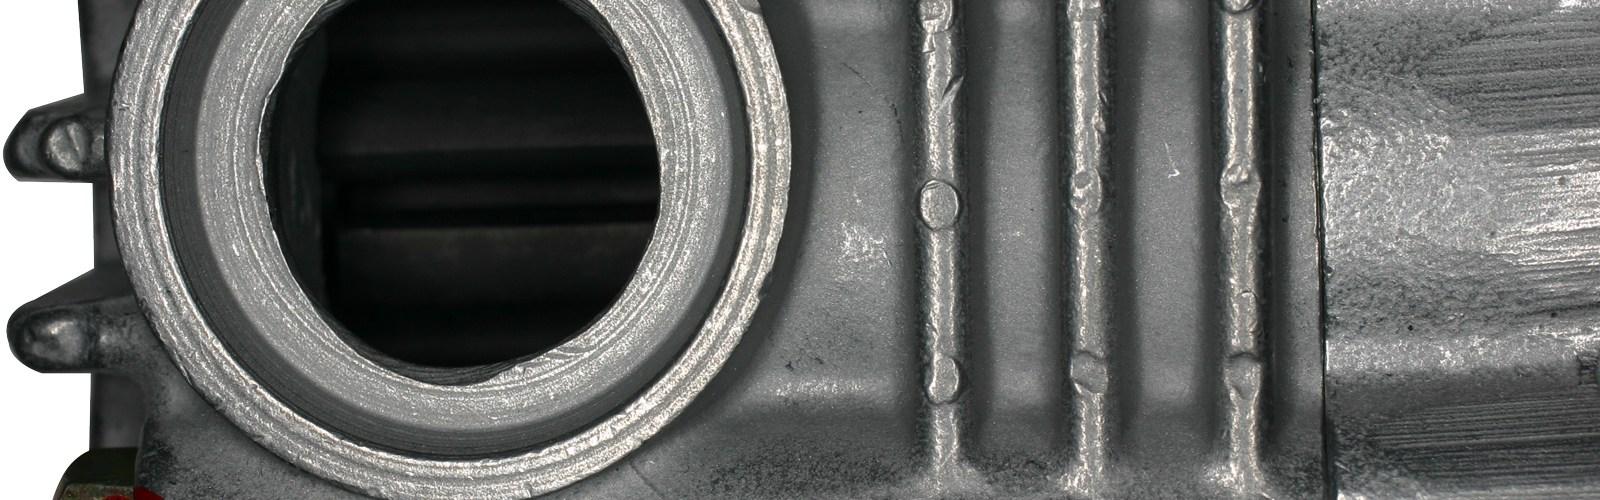 GT Series 1 - 78-98 930 Turbo